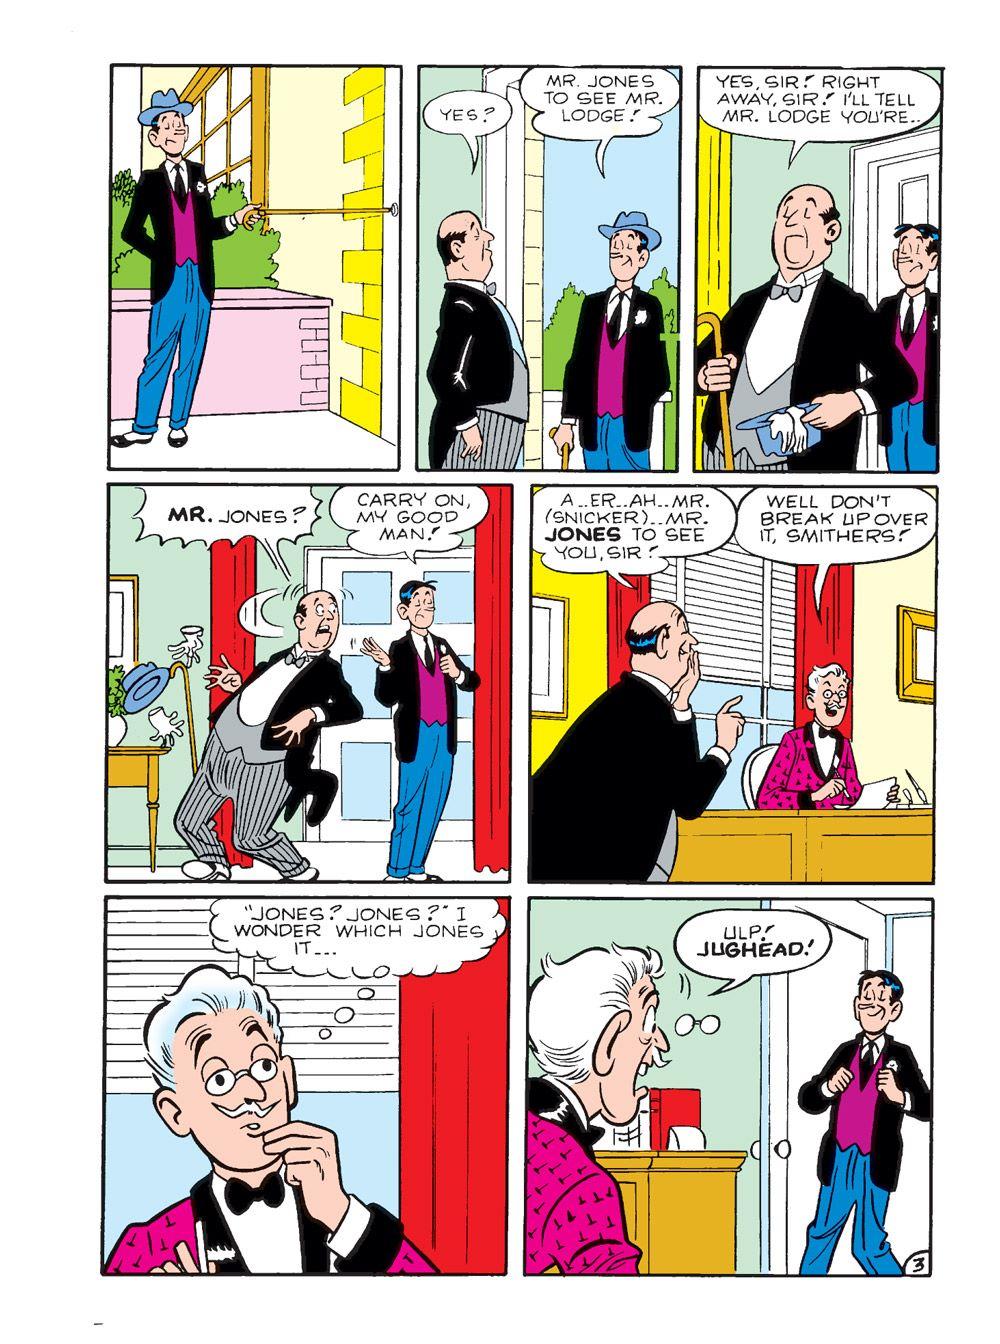 WorldOfArchieJumboComicsDigest_109-138 ComicList Previews: WORLD OF ARCHIE JUMBO COMICS DIGEST #109